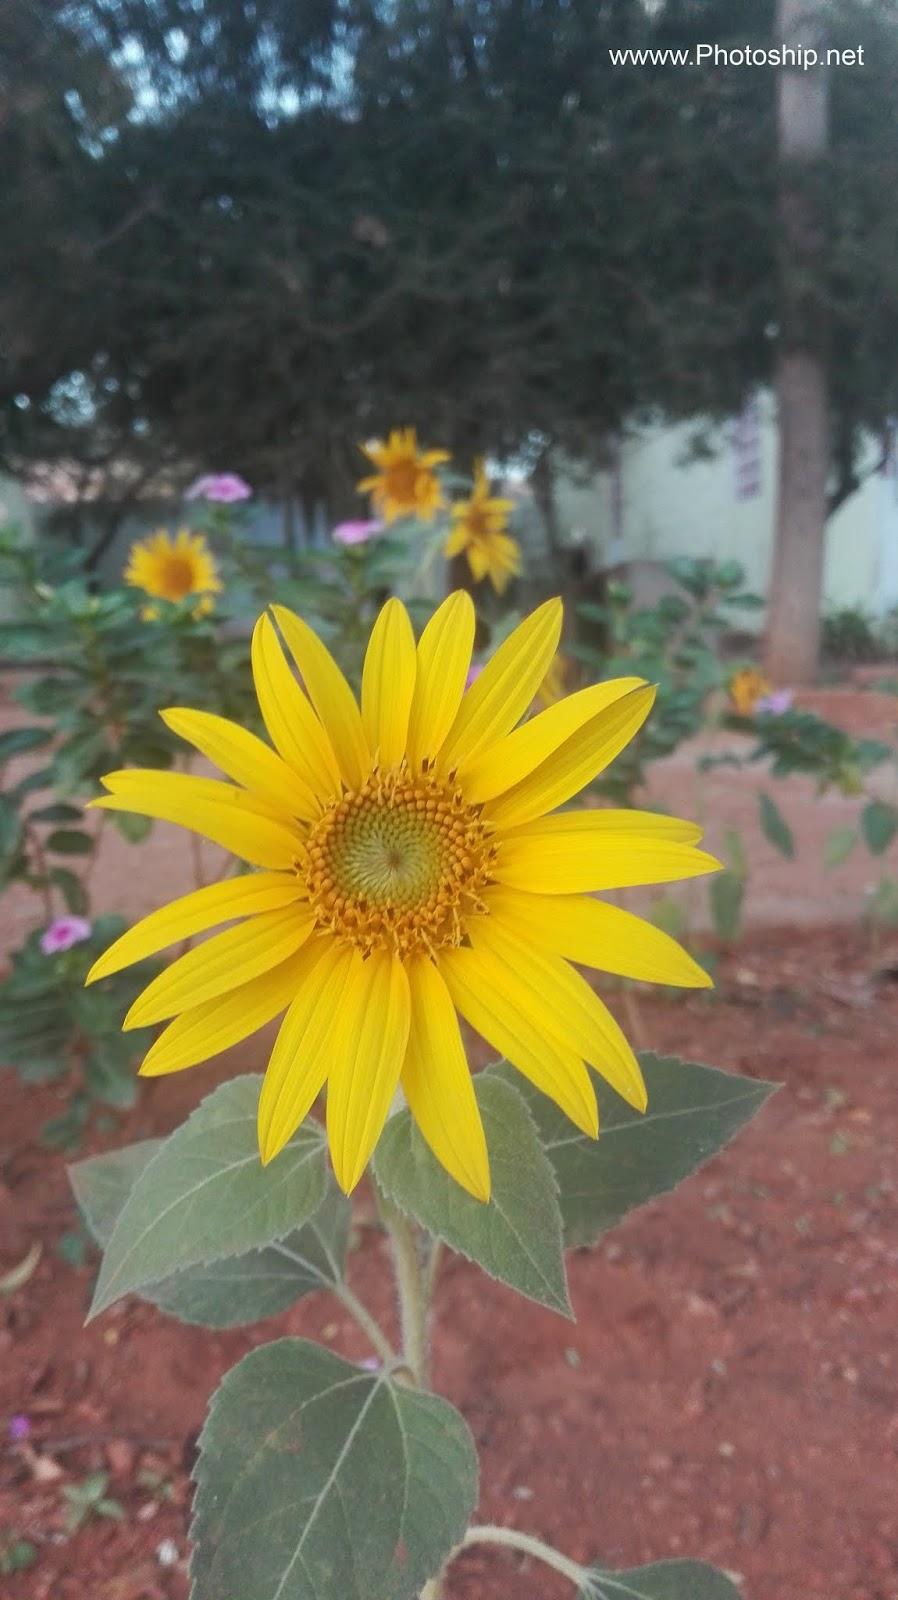 sunflower symbolize adoration loyalty photoship net. Black Bedroom Furniture Sets. Home Design Ideas